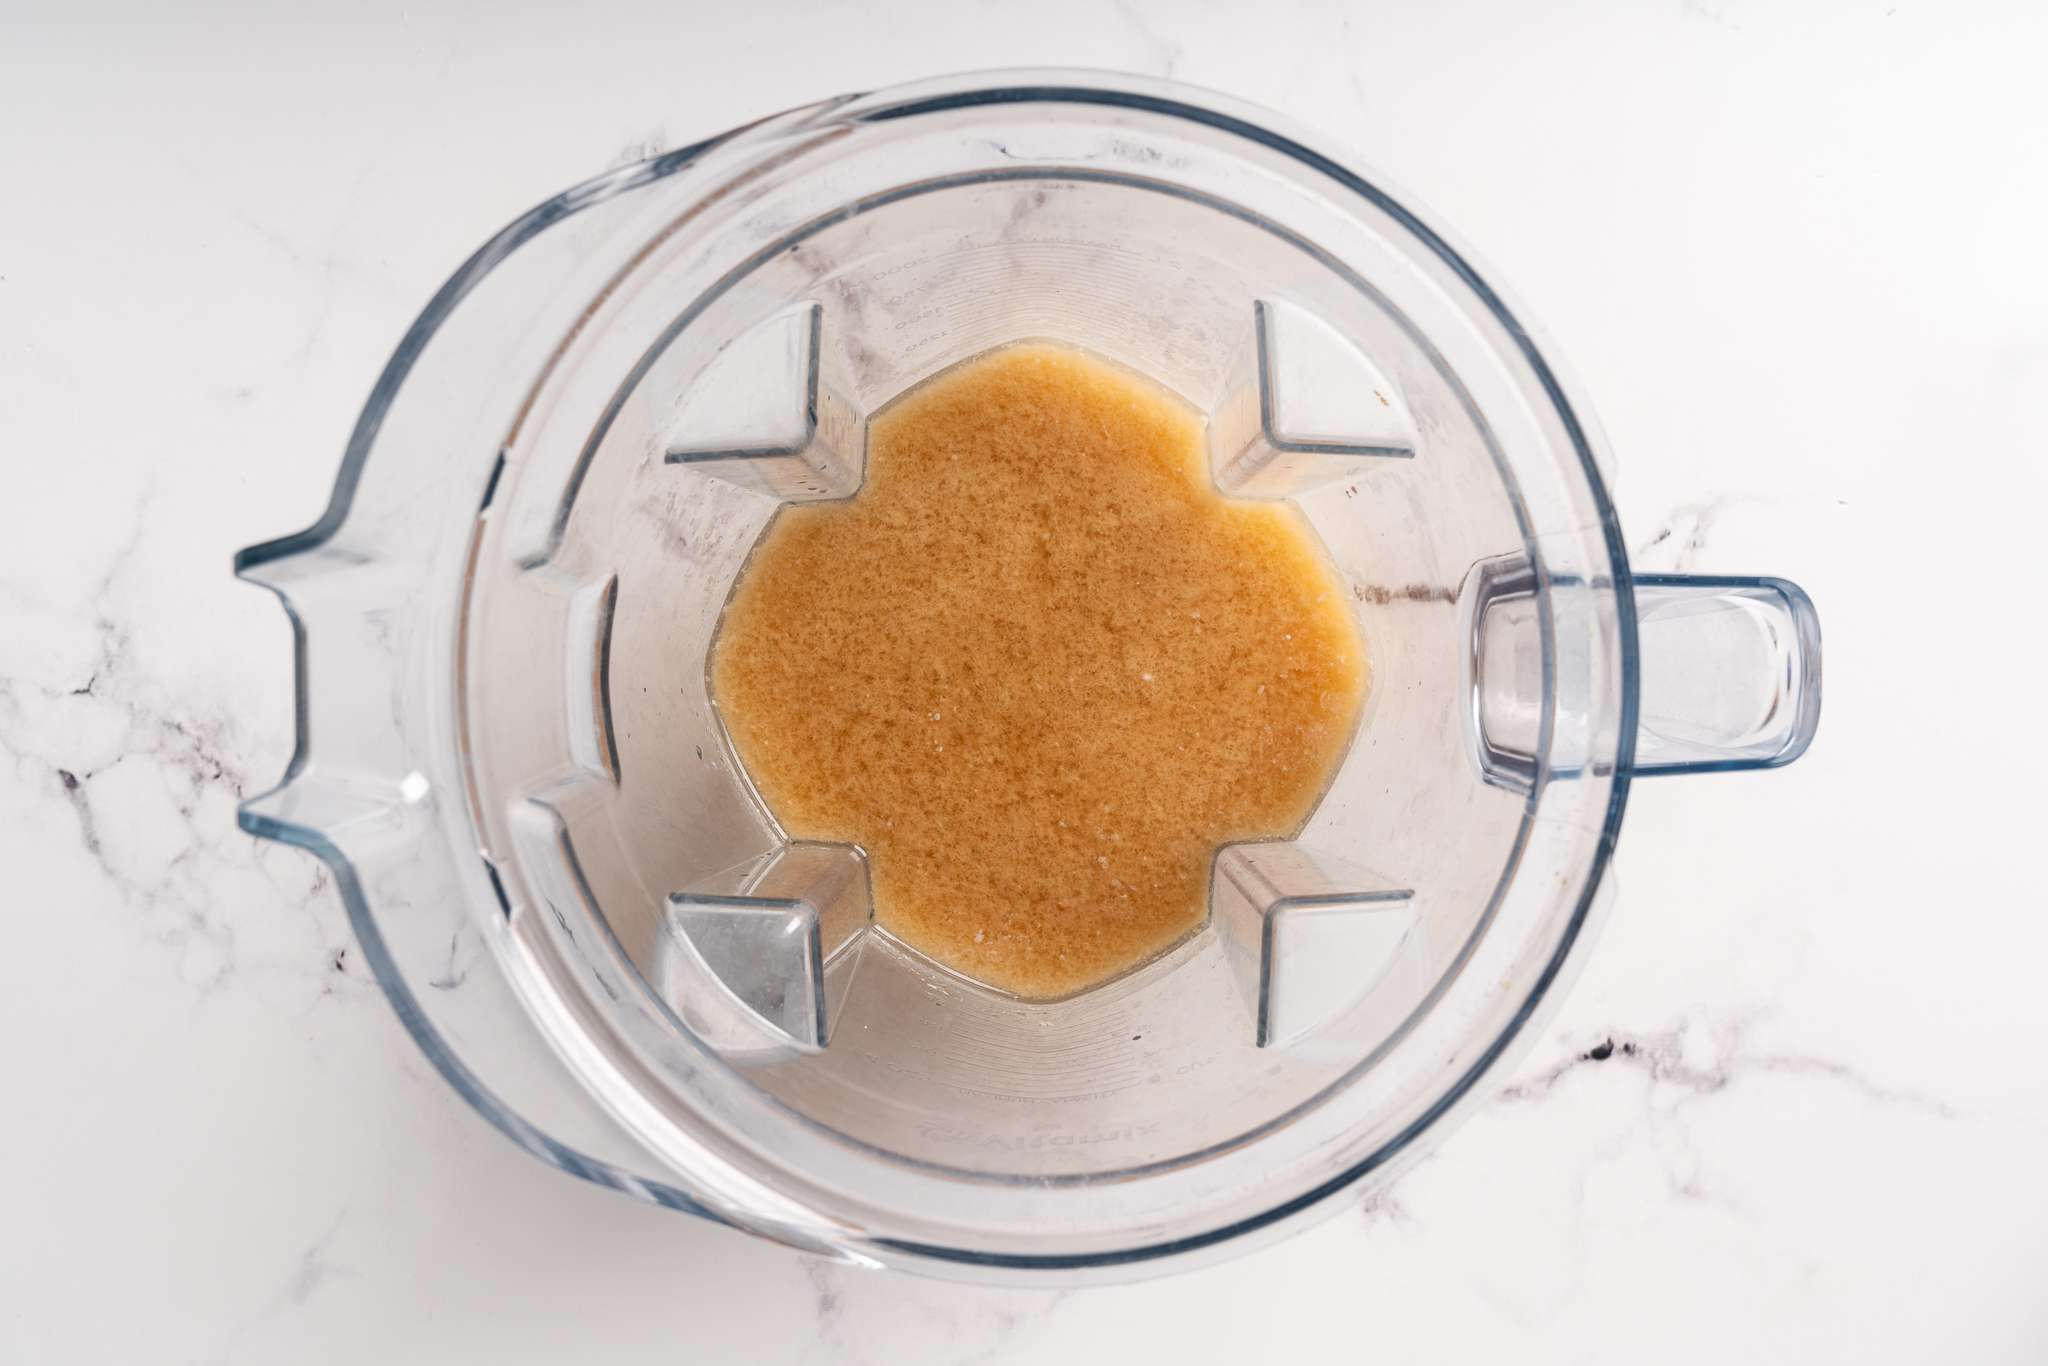 Add the Powerade, coconut milk, orange zest, lemon juice, salt, vanilla, and stevia into a blender